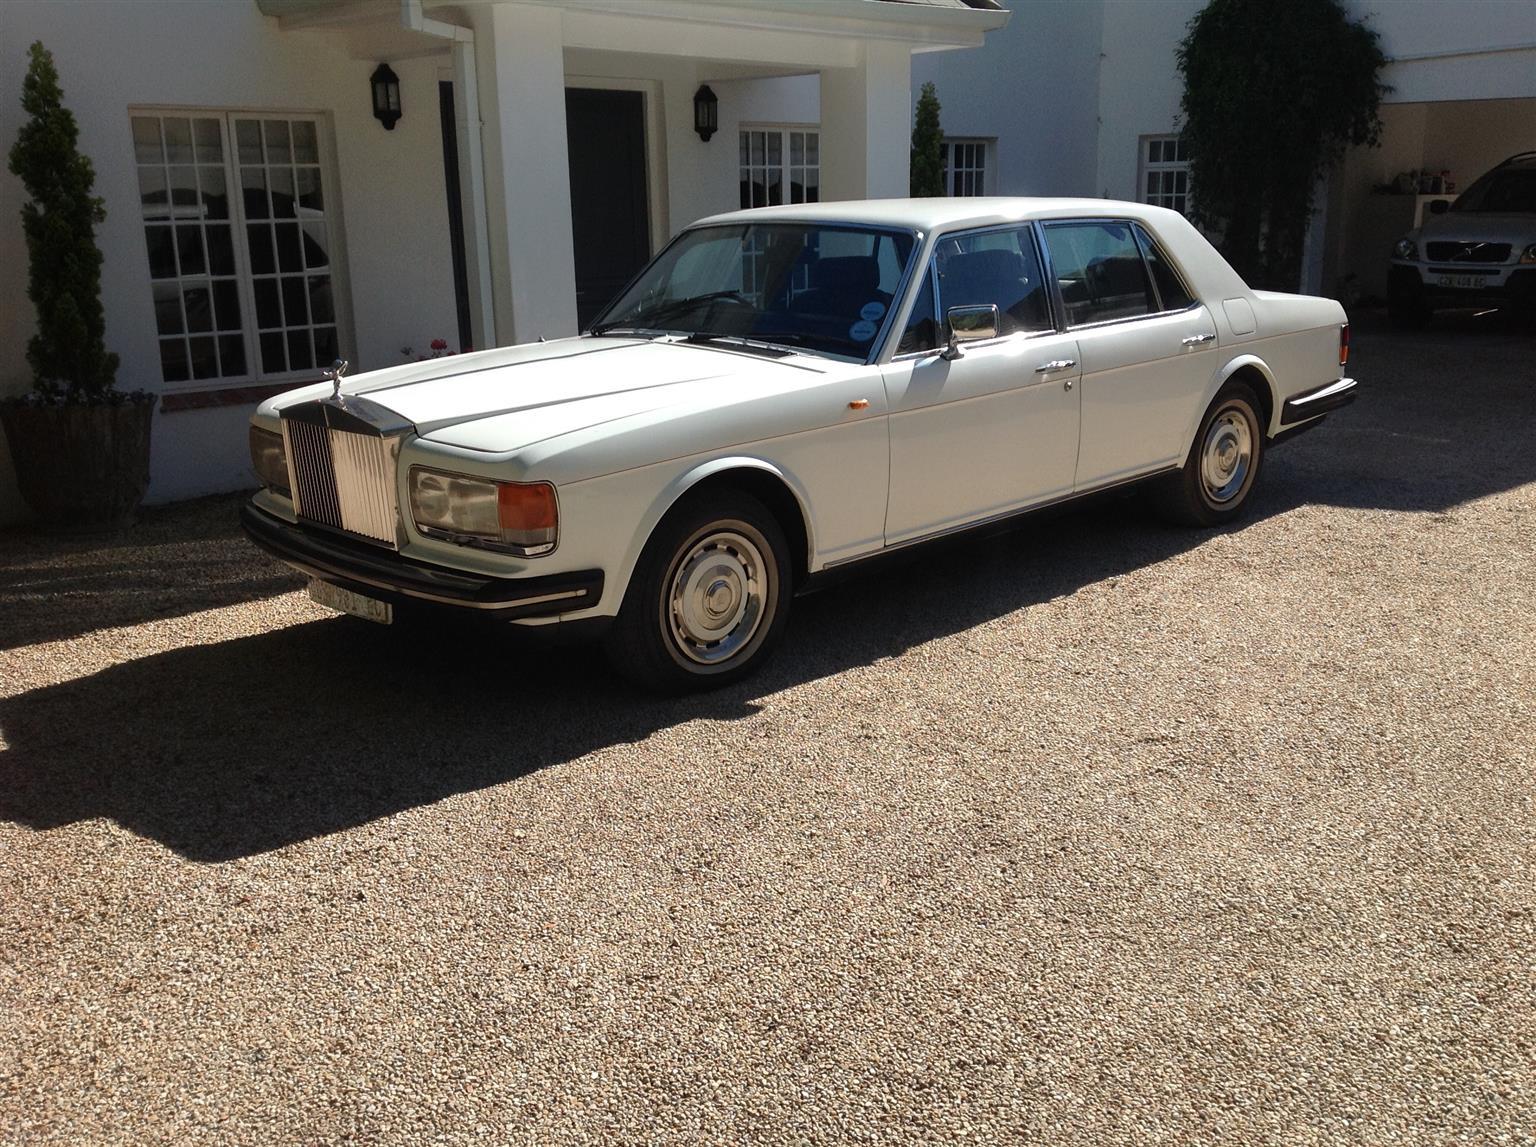 1981 Rolls Royce silver spirit for sale